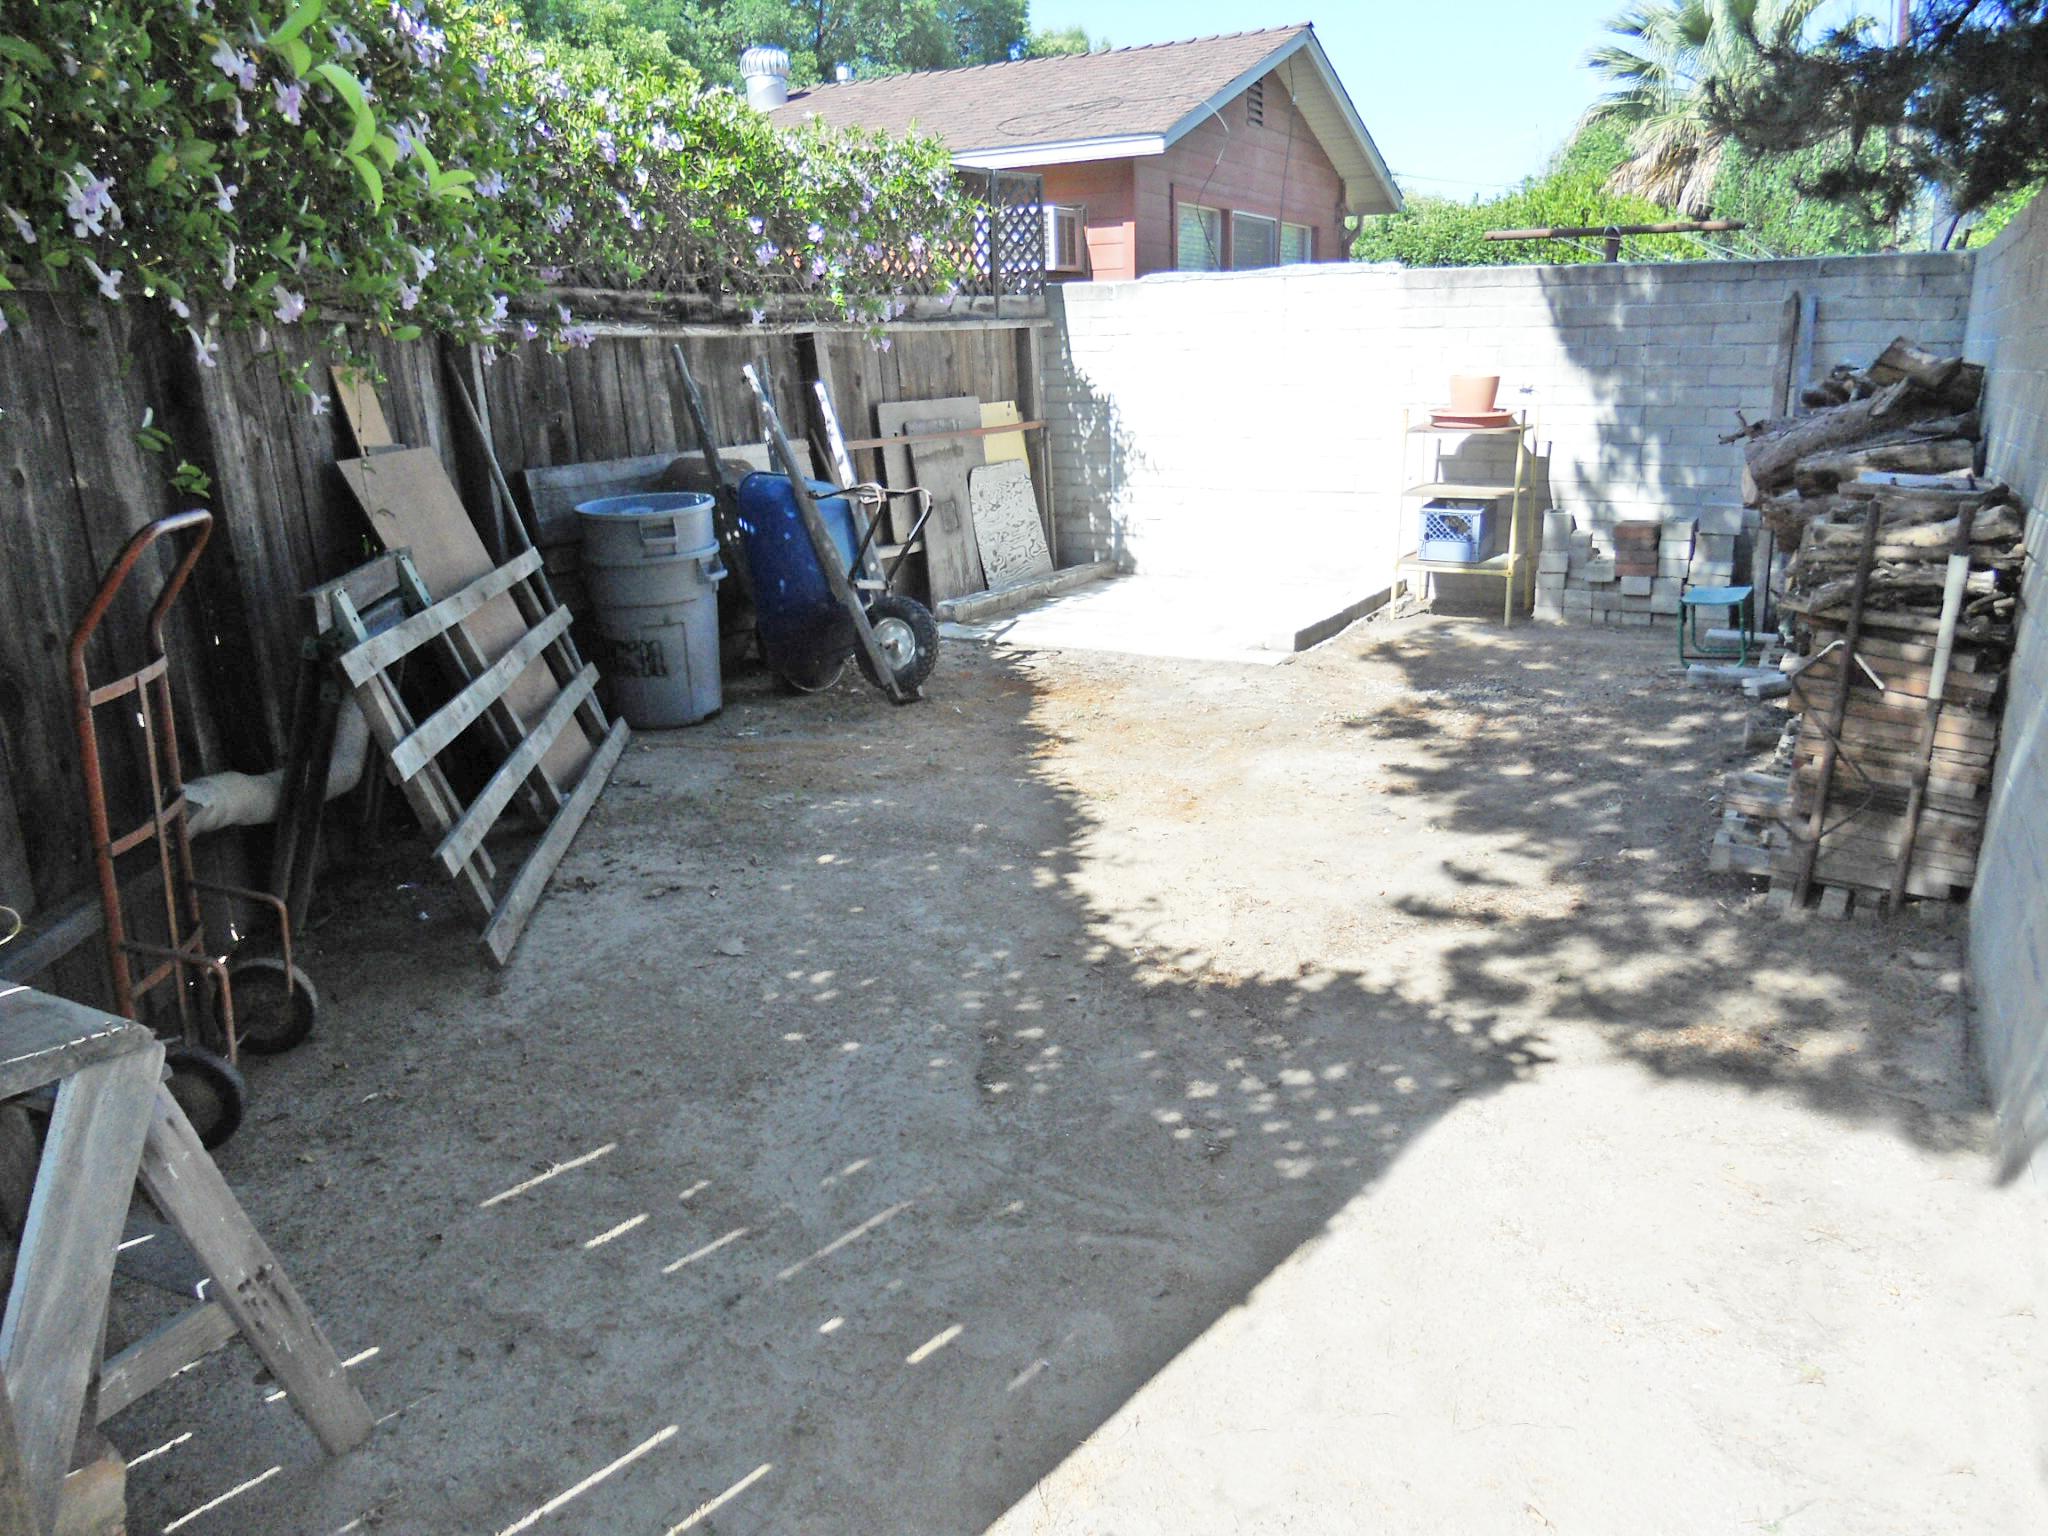 Huge hidden storage area in back corner of yard -- or plant raised-bed gardens!